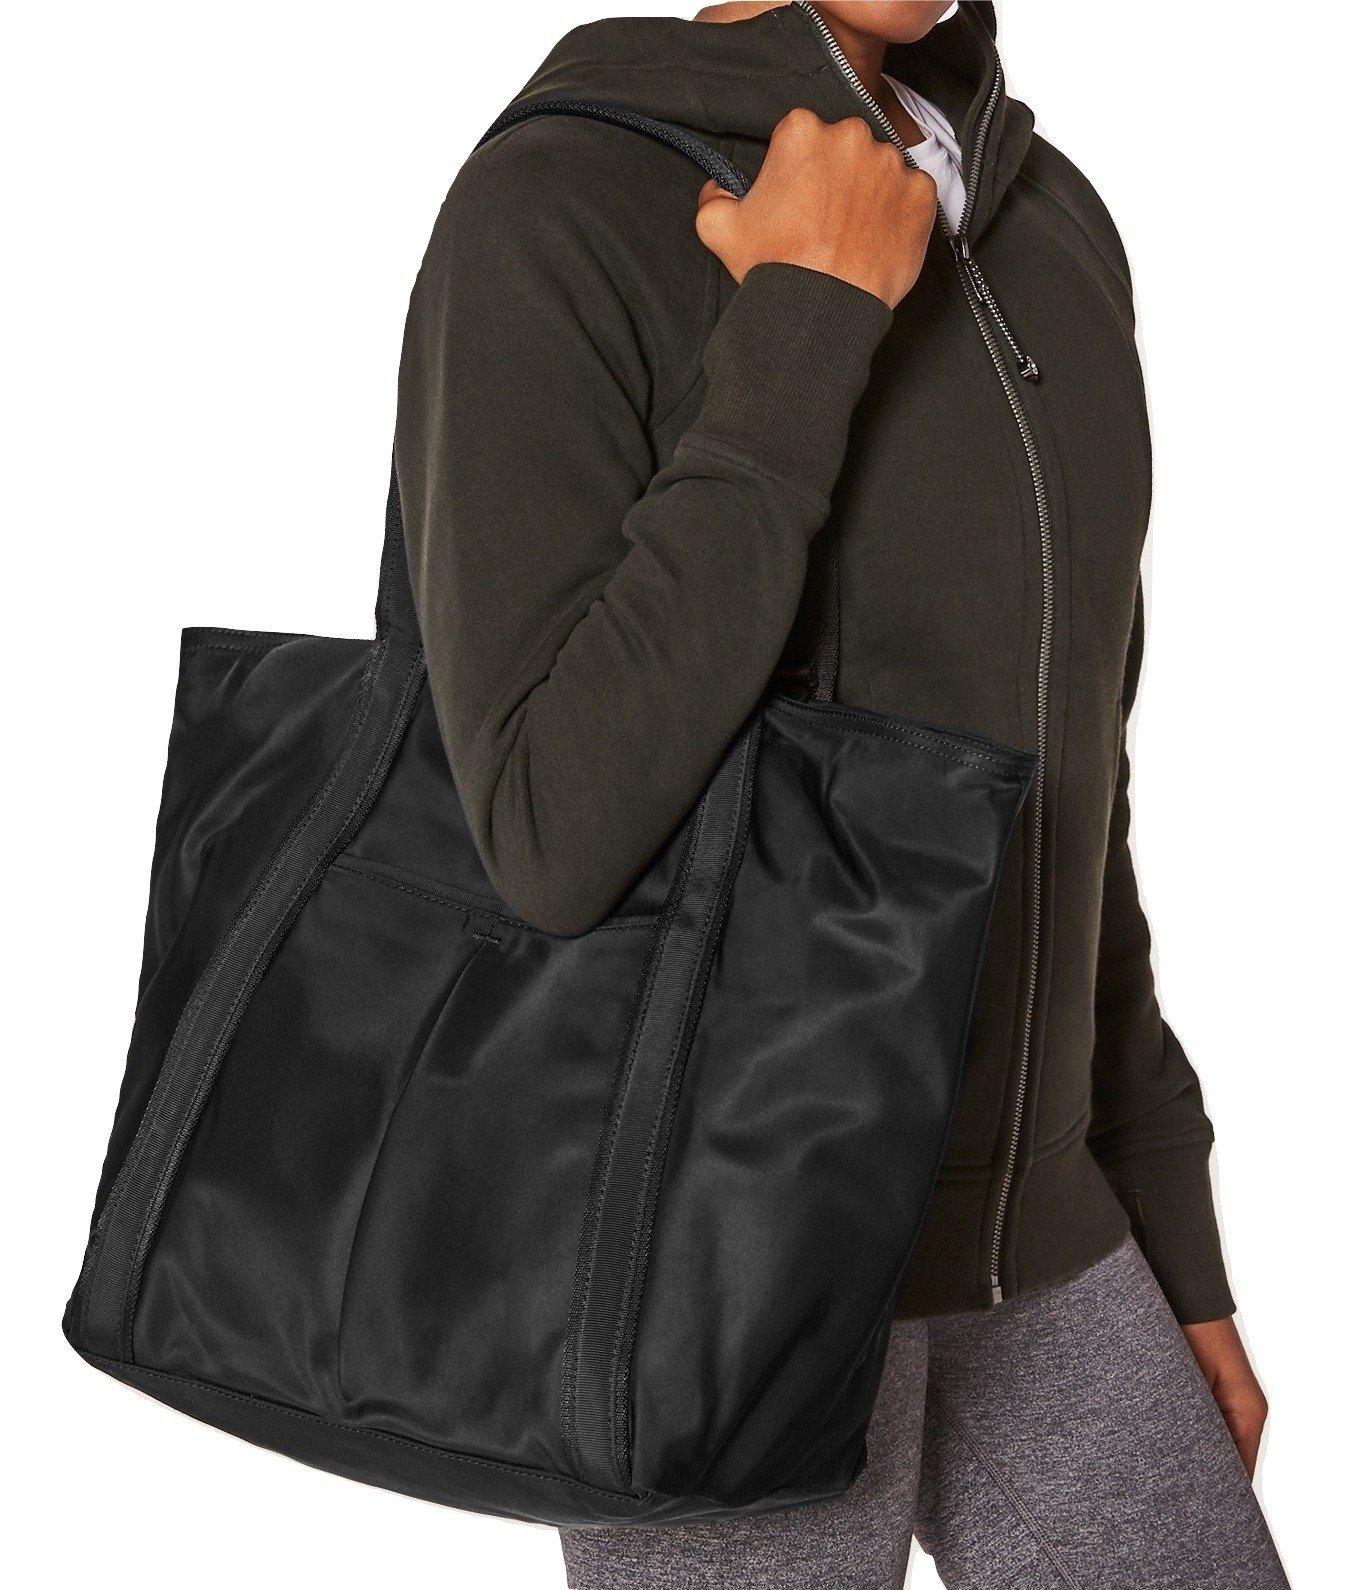 Lululemon Live Free Tote Bag (Black)